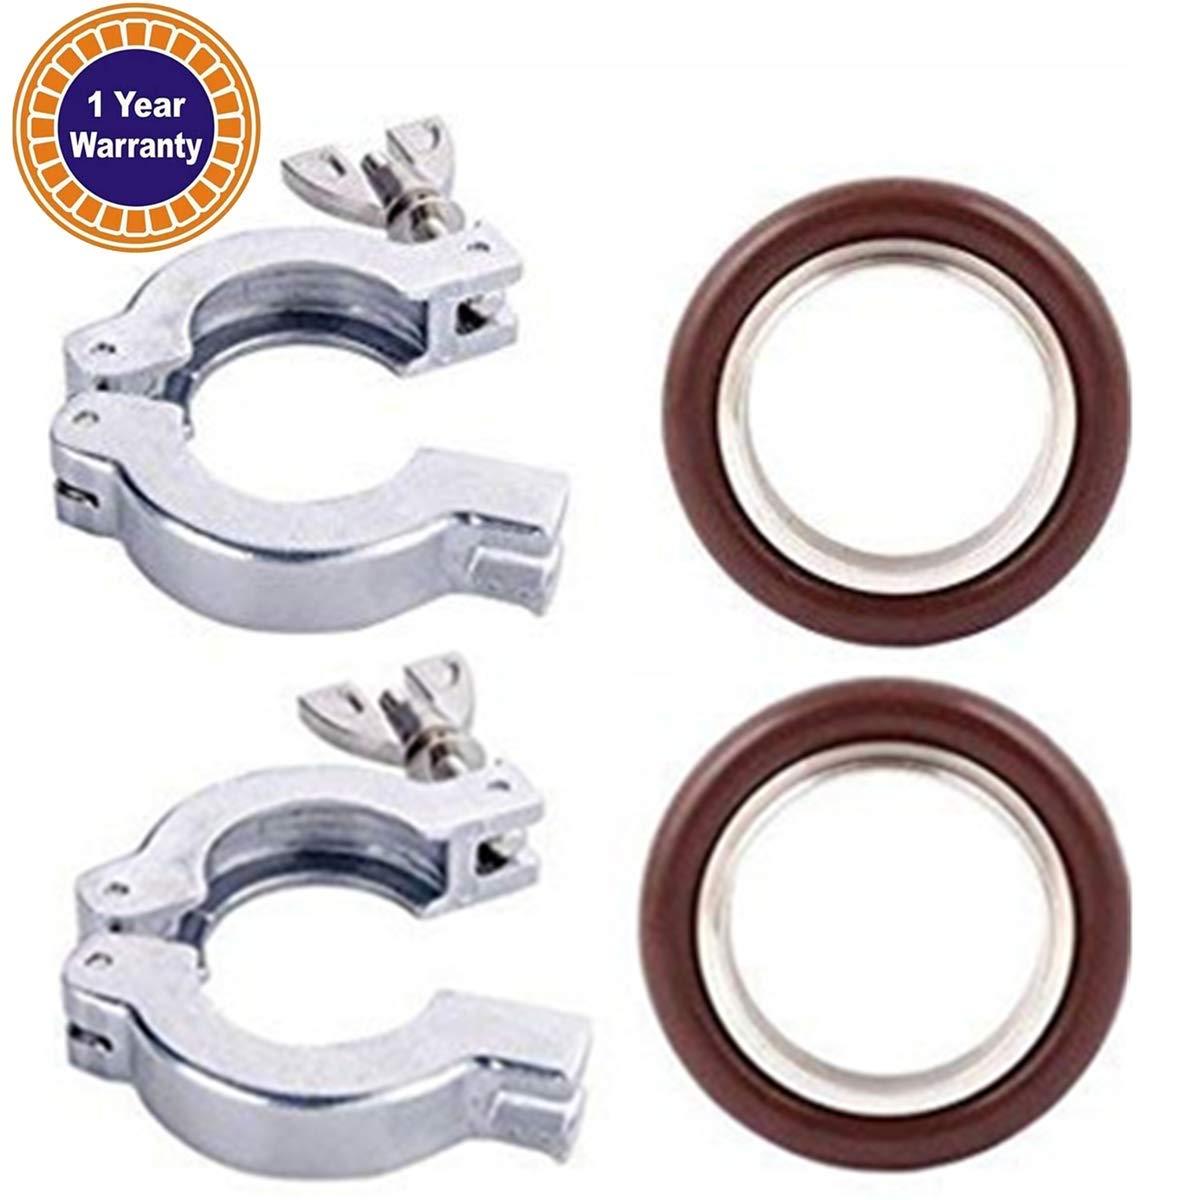 2 Sets KF-16 Aluminium Clamp Ring + KF16 Stainless Steel/Buna 304 Centering Ring FKM